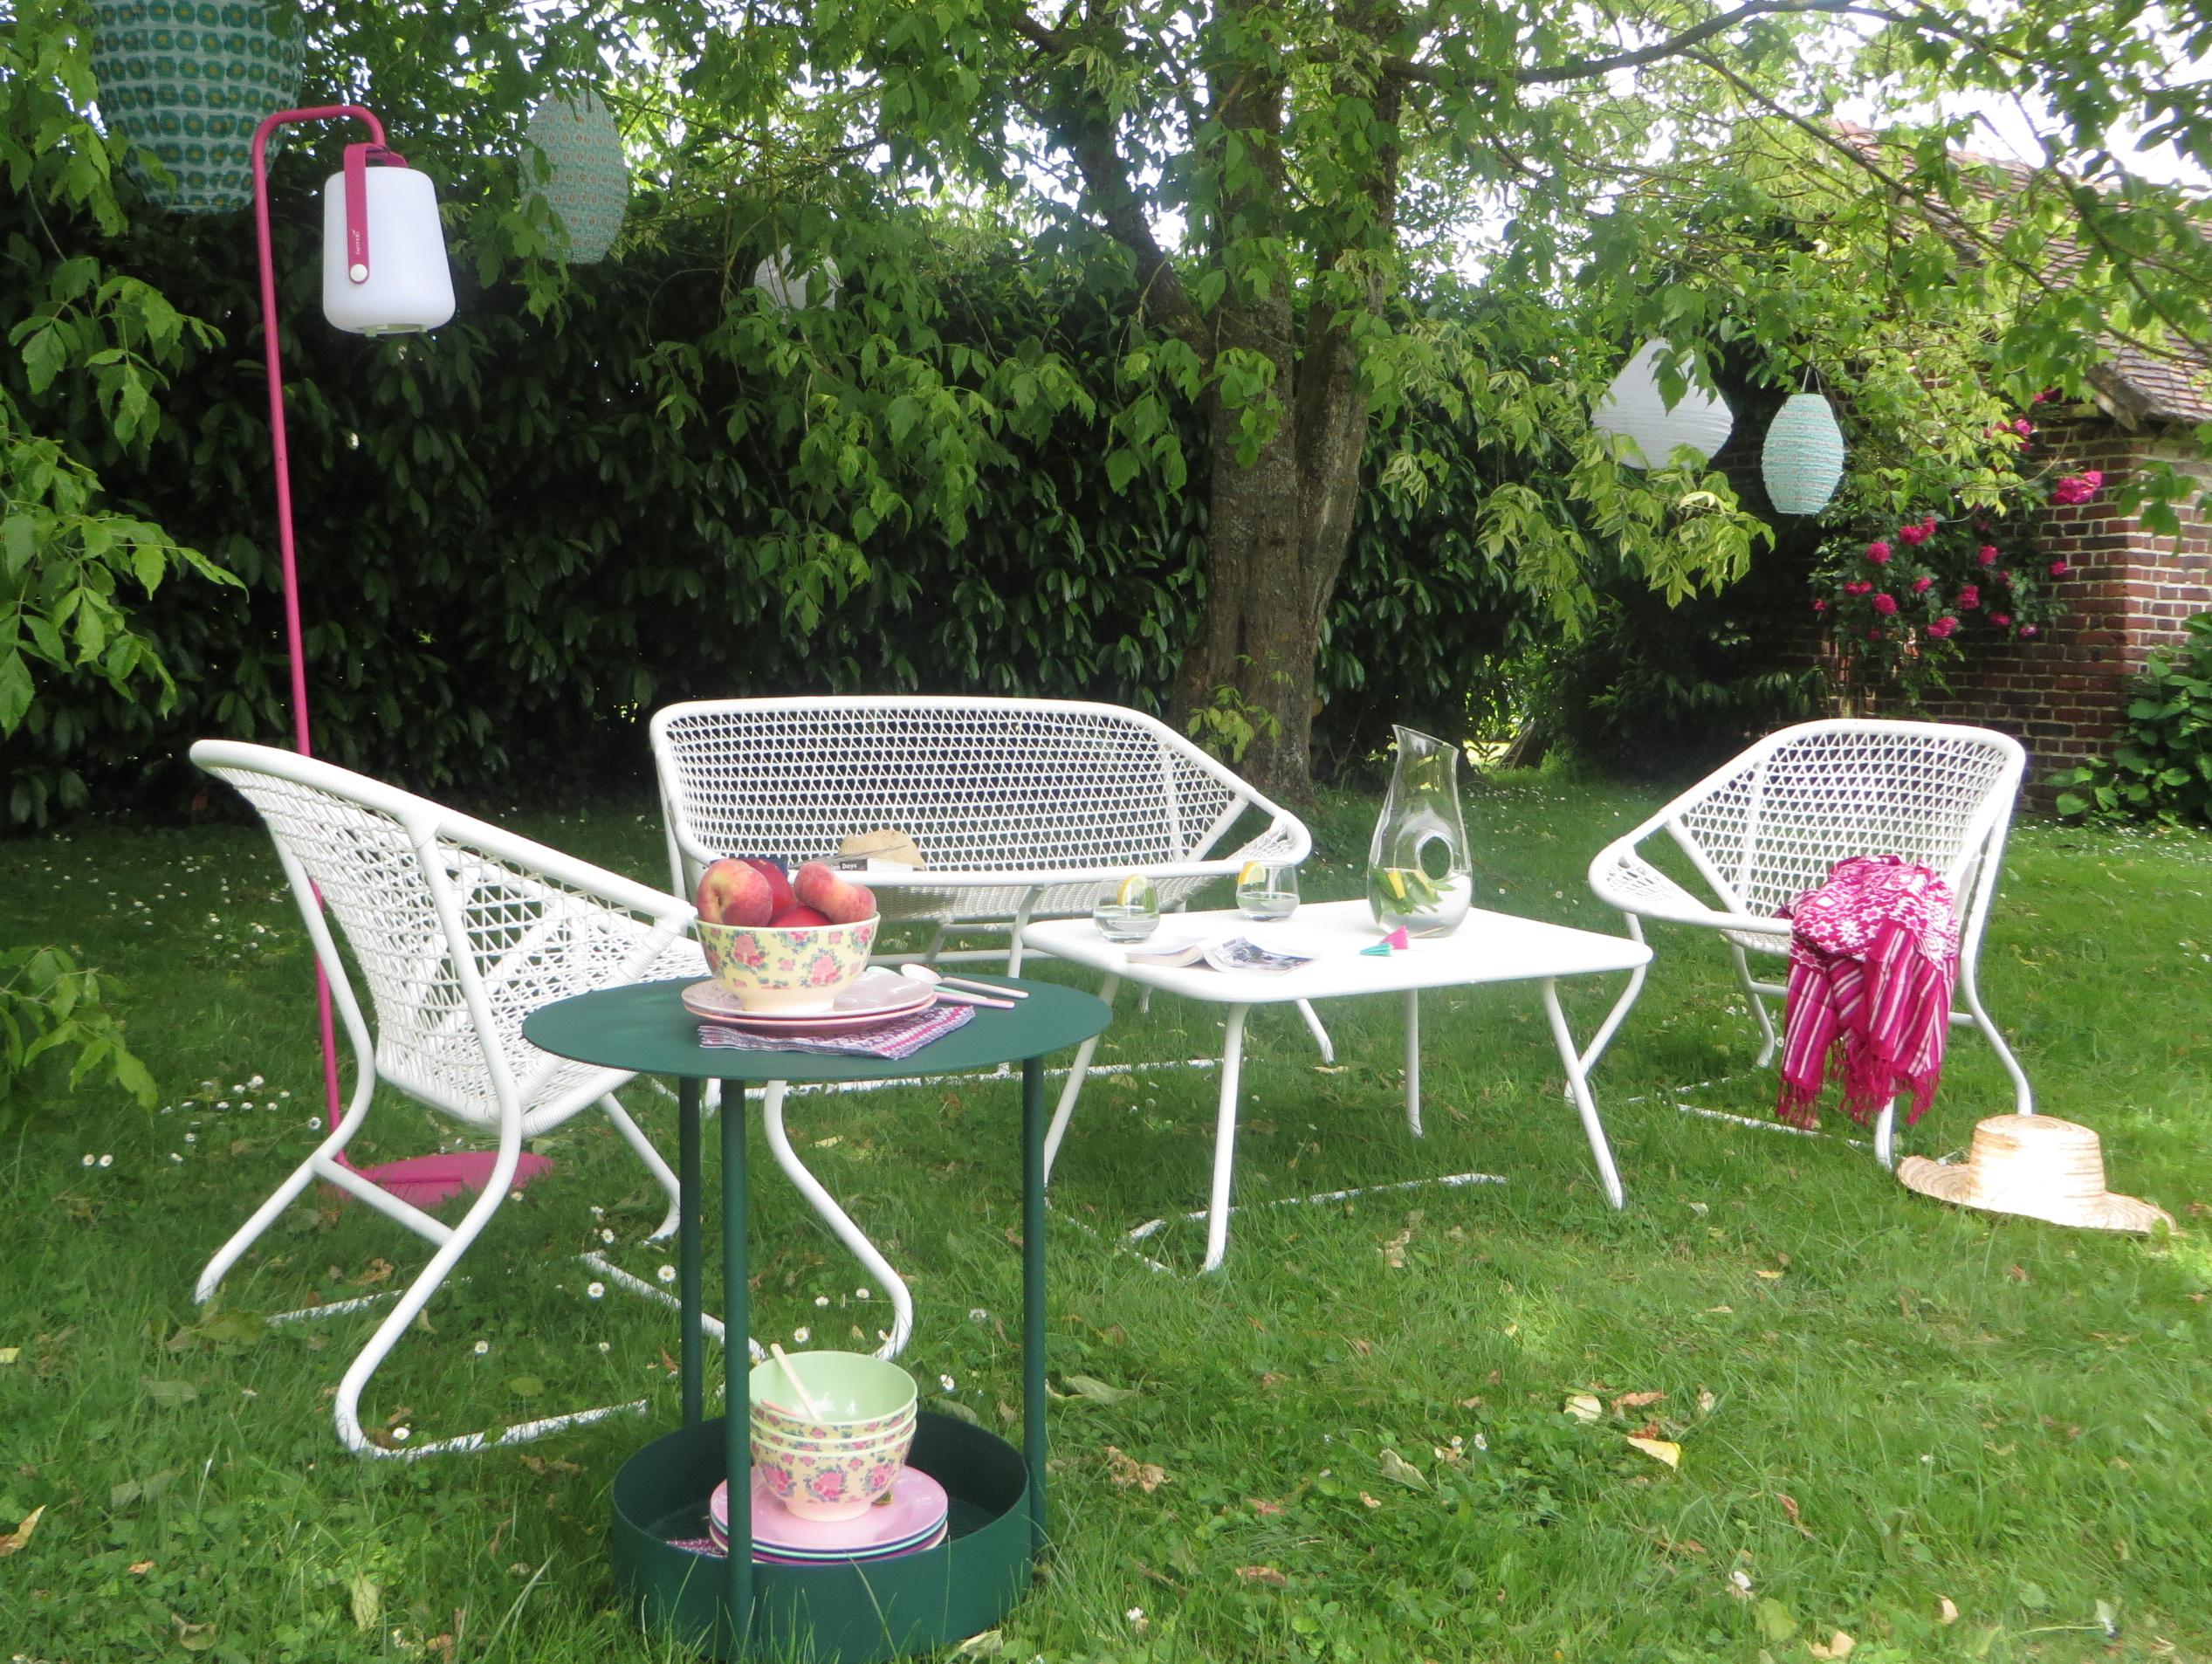 Salon de jardin fermob sixties - Mailleraye.fr jardin